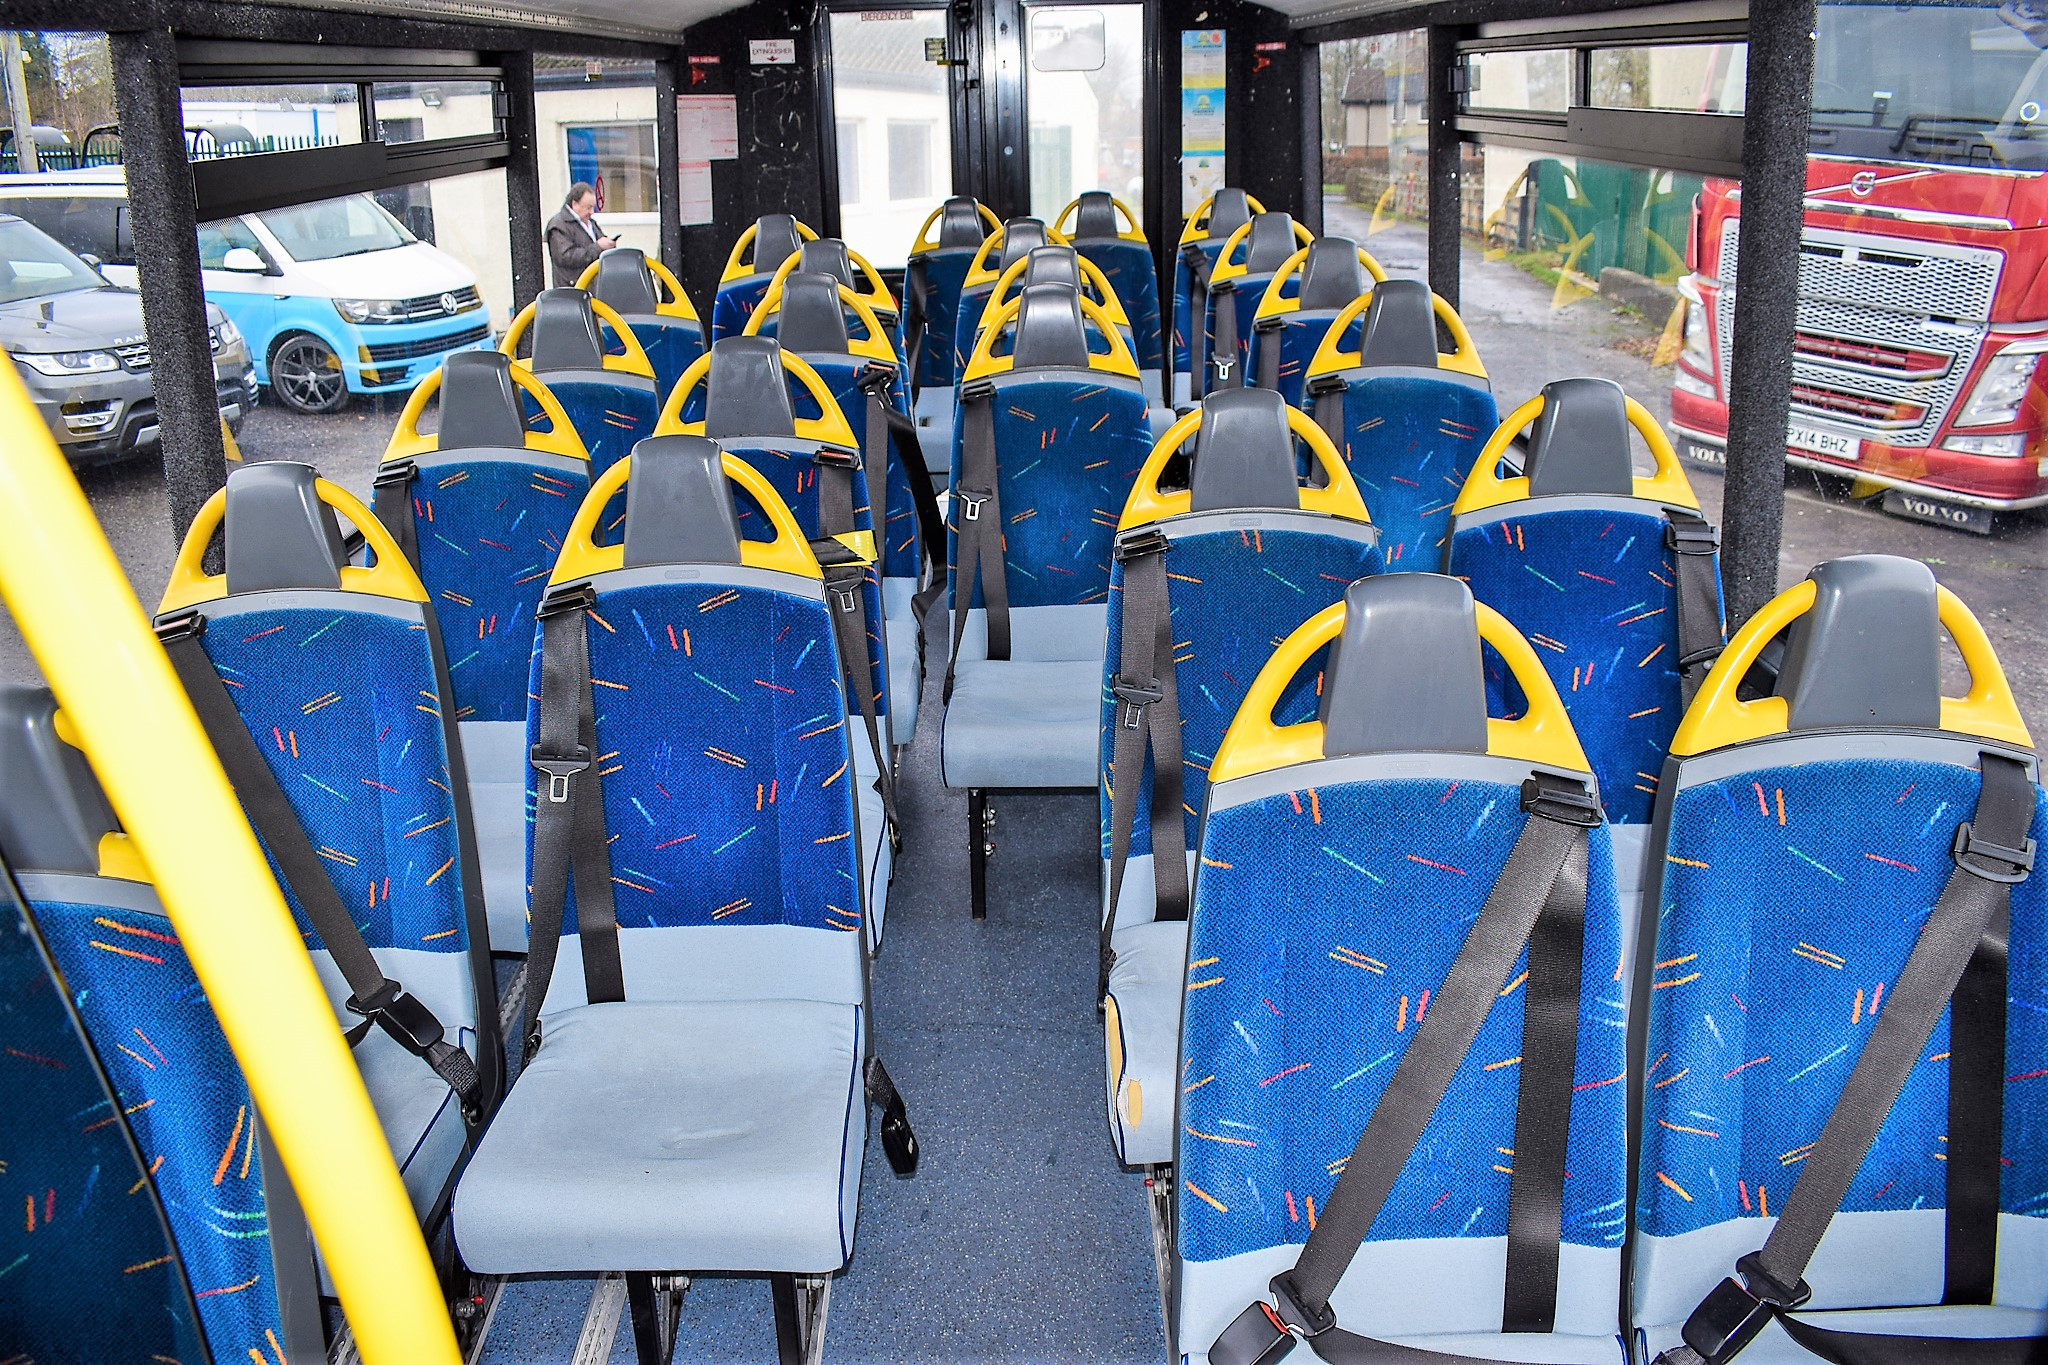 Lot 17B - Mercedes Benz O 813 24 seat mini bus Registration Number: DK58 CWN Date of Registration: 10/09/